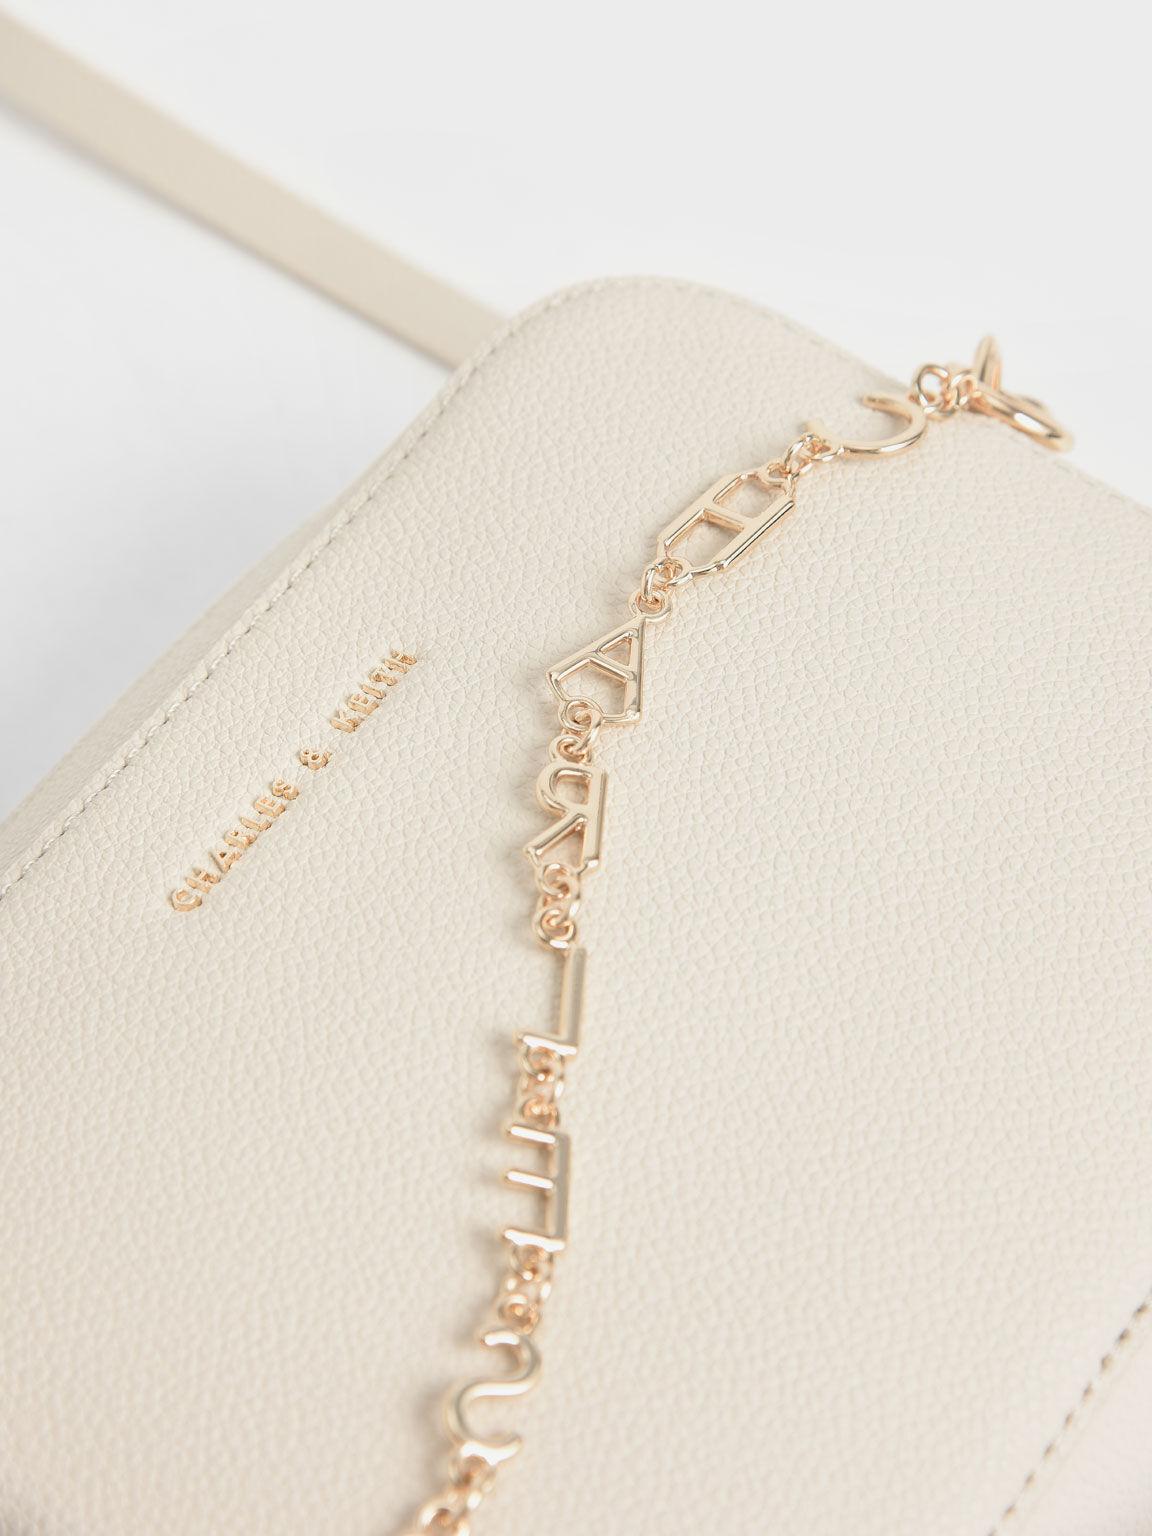 Chain Link Boxy Clutch, Cream, hi-res